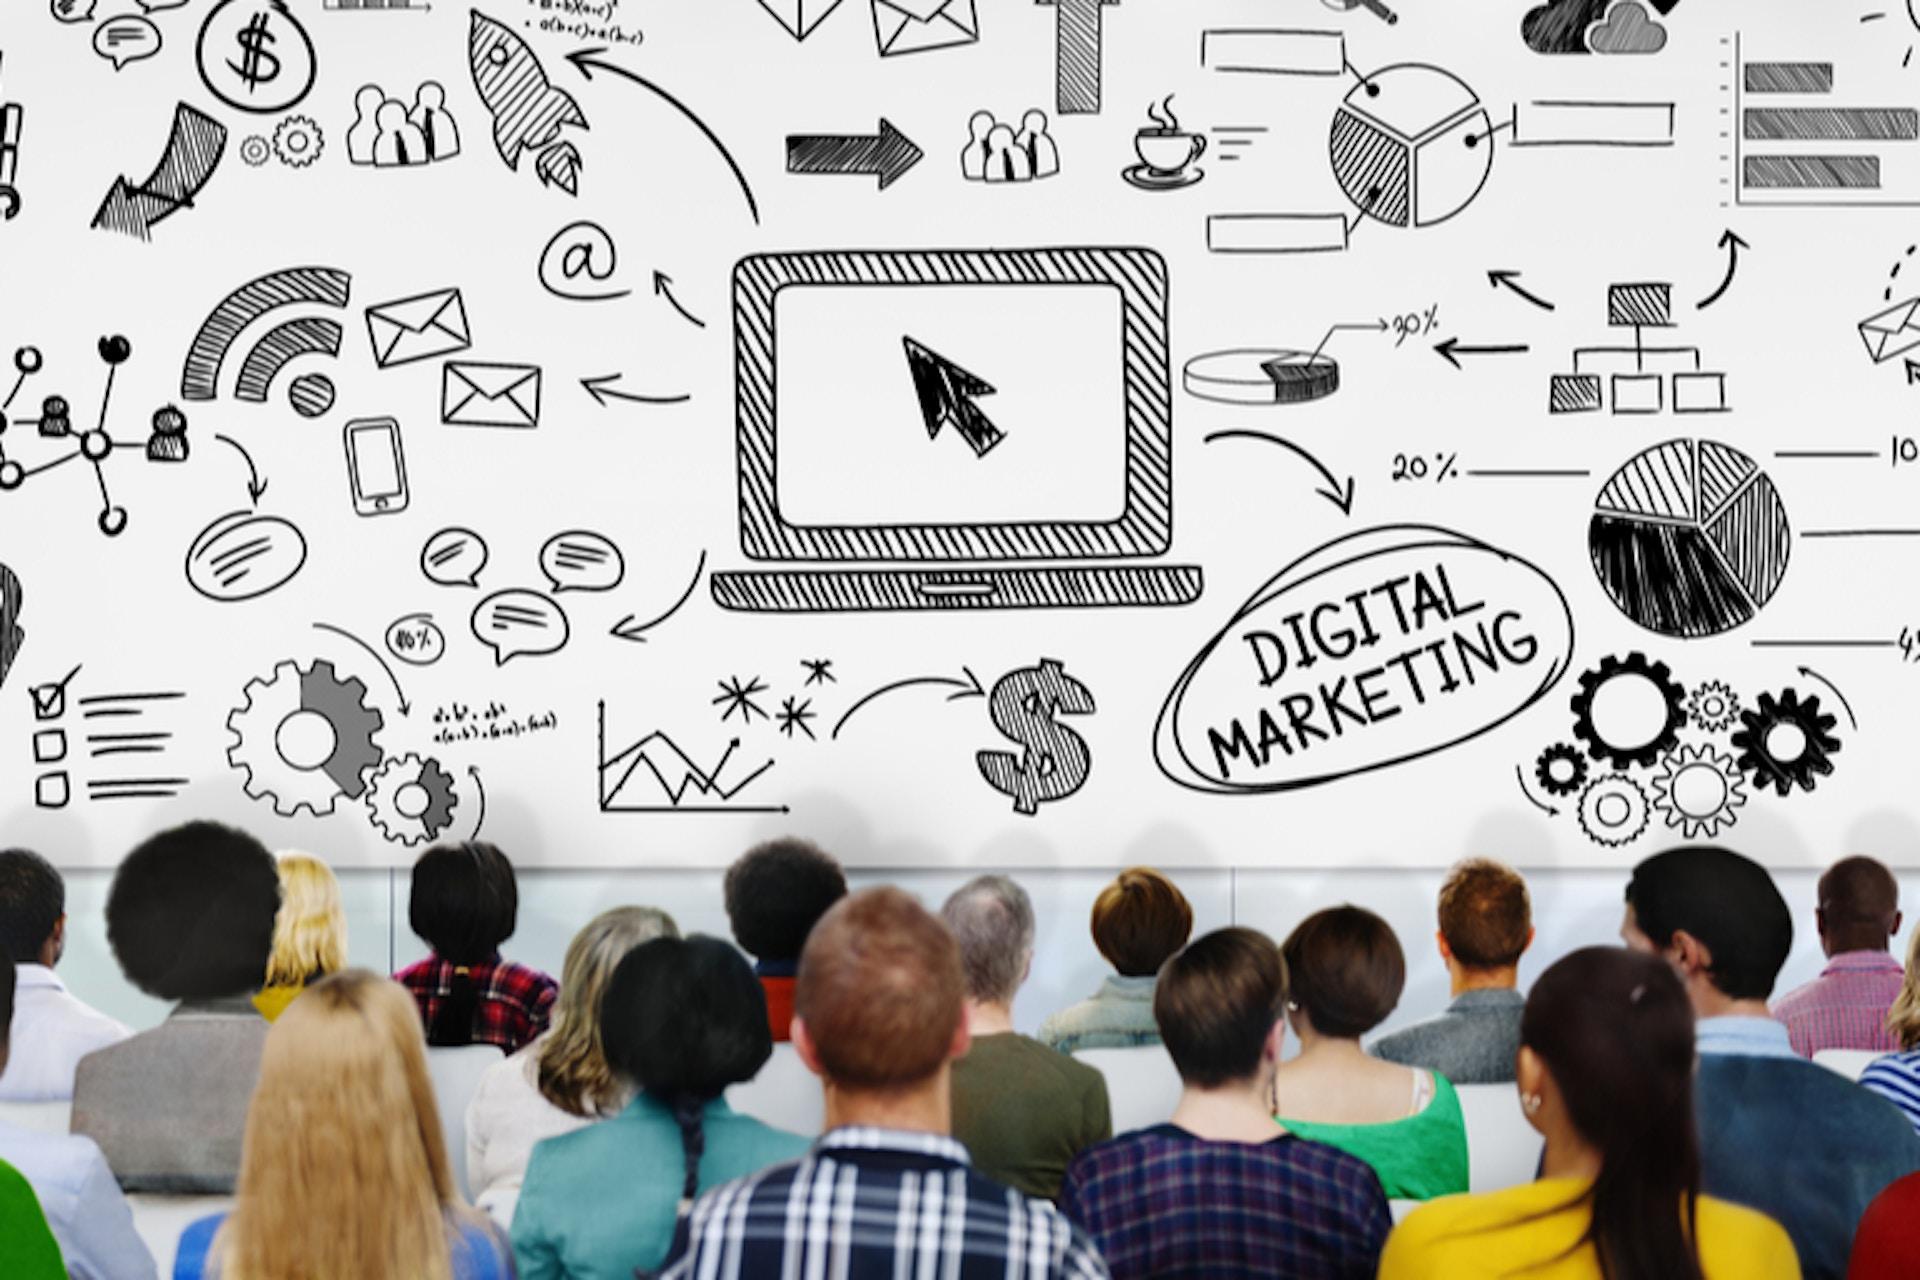 Digital Marketing event